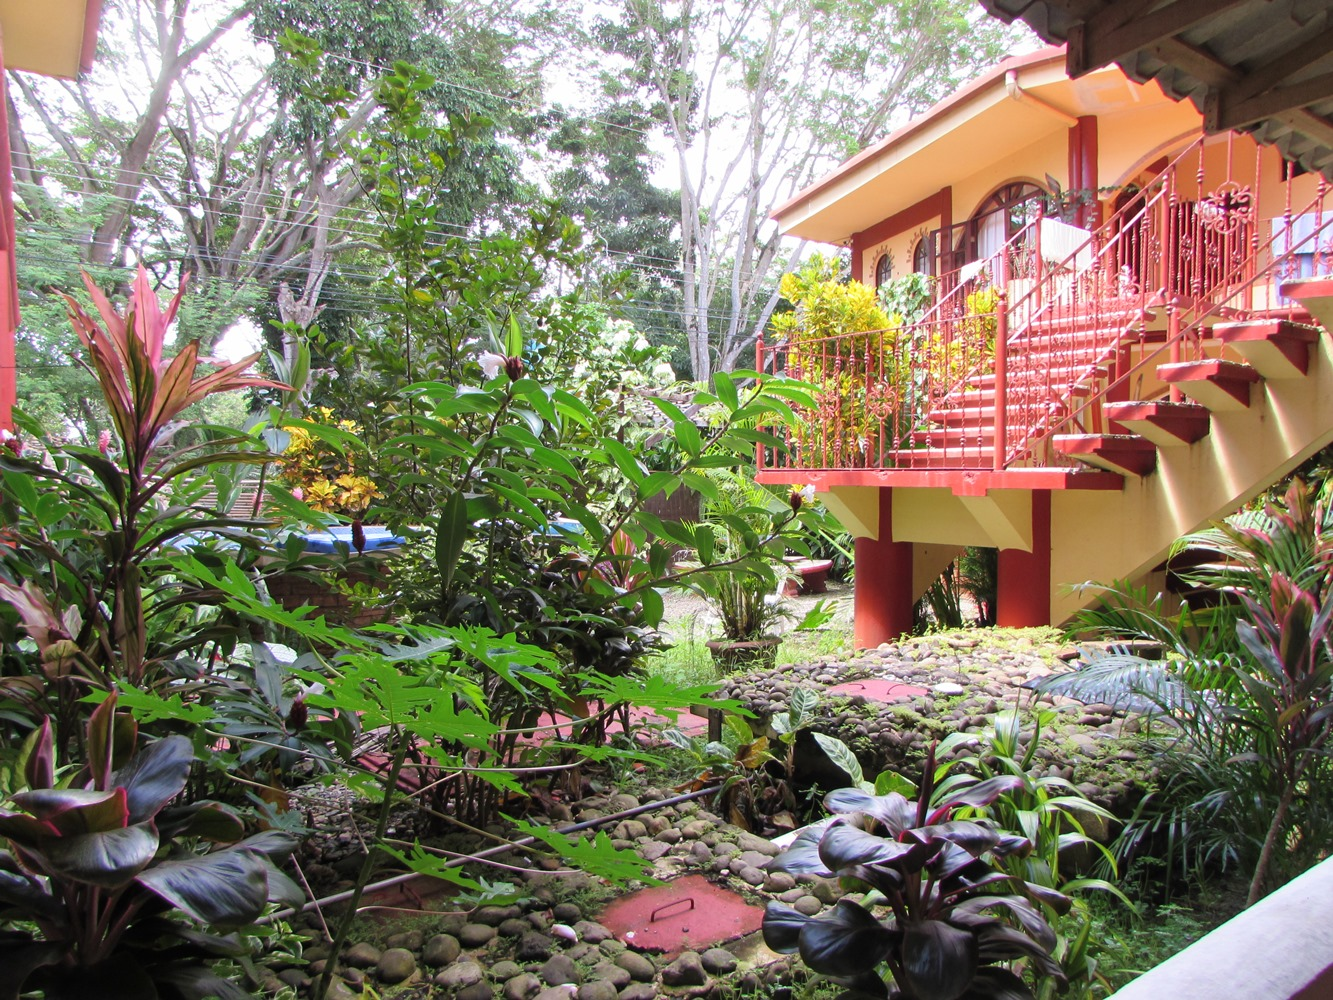 946 Dominical Hotel 001028.JPG